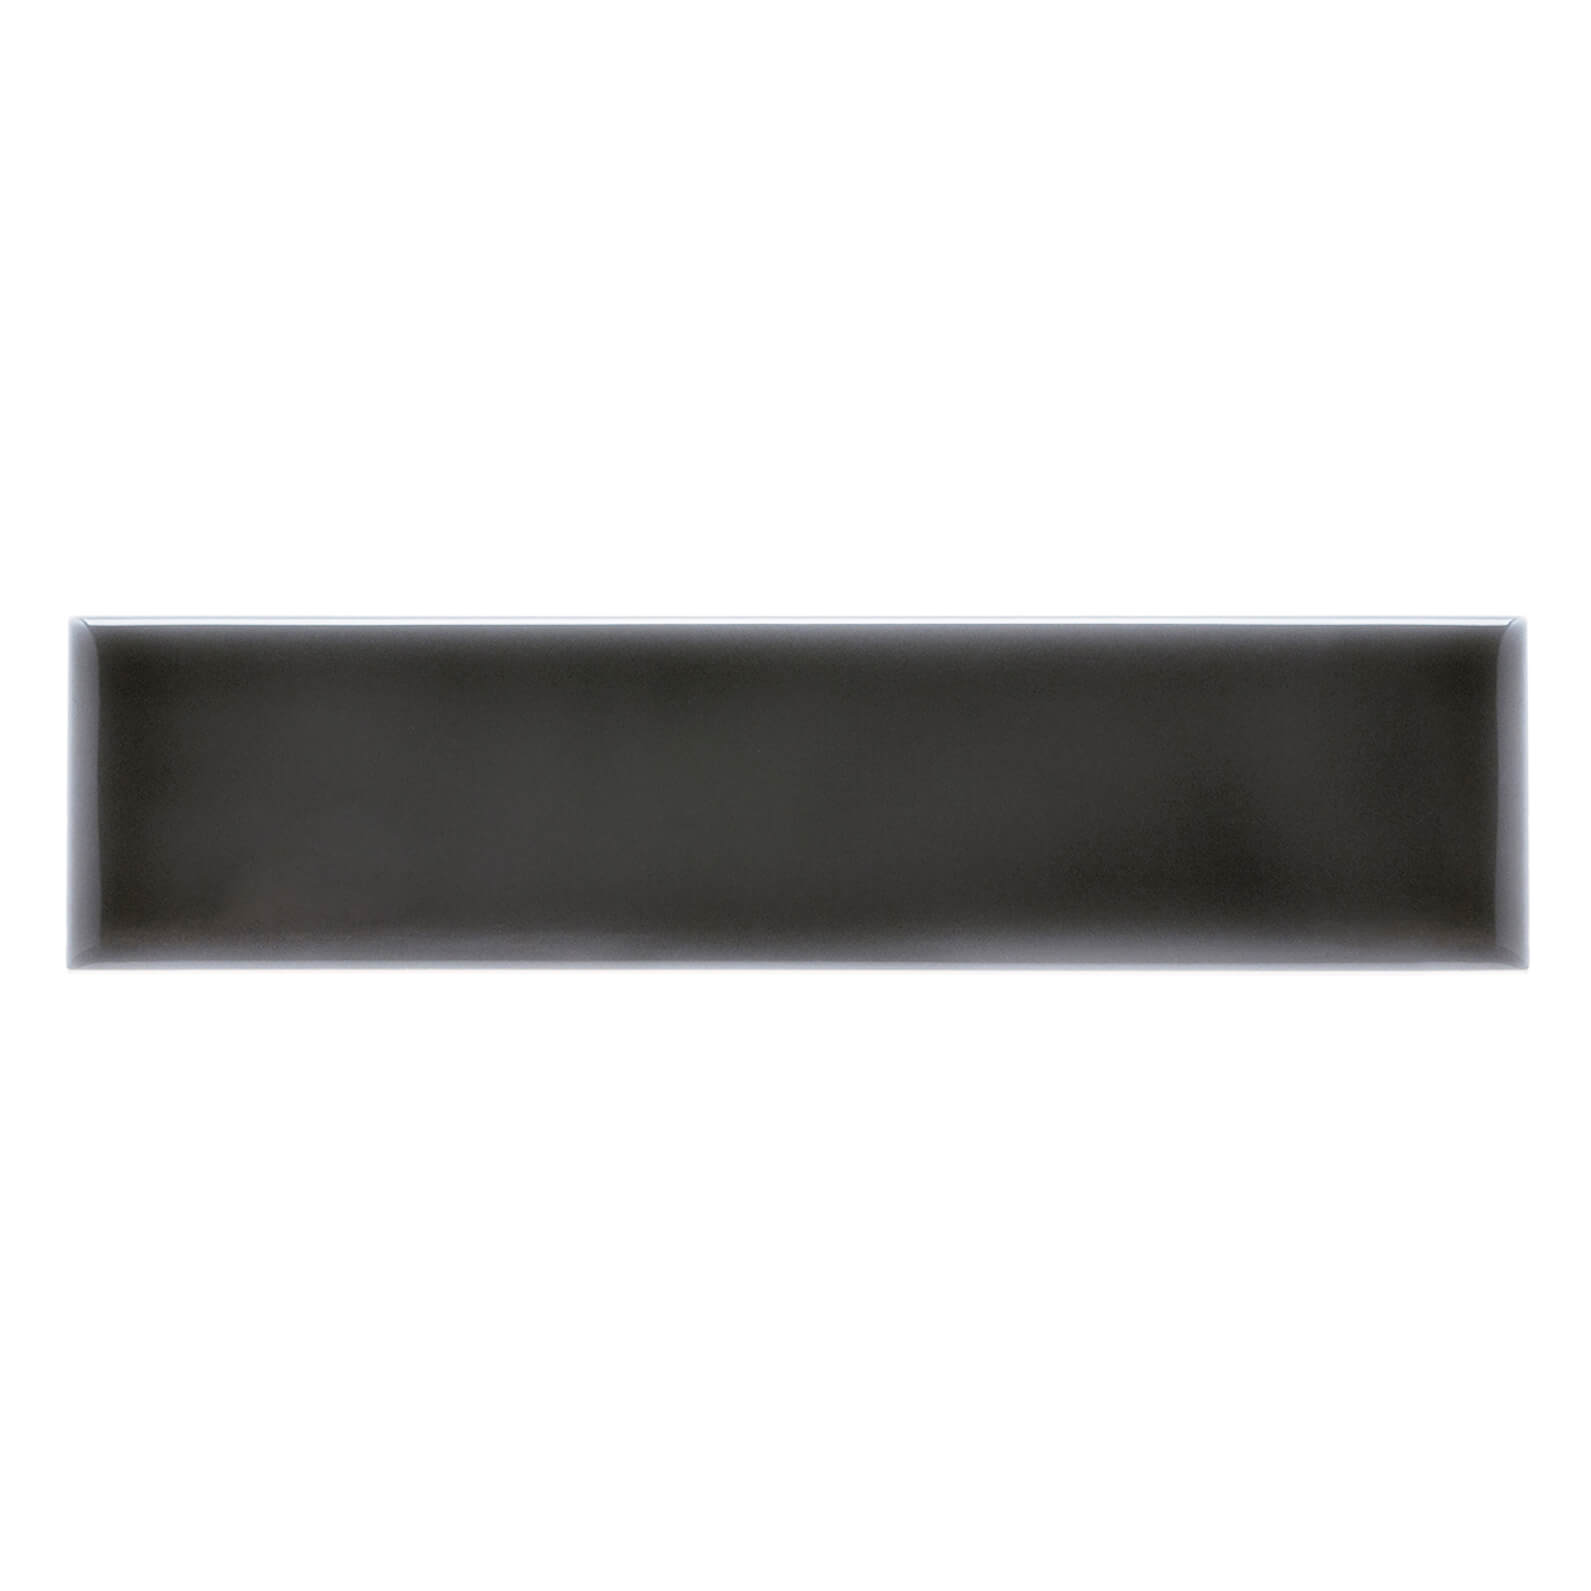 ADST1040 - LISO  - 4.9 cm X 19.8 cm